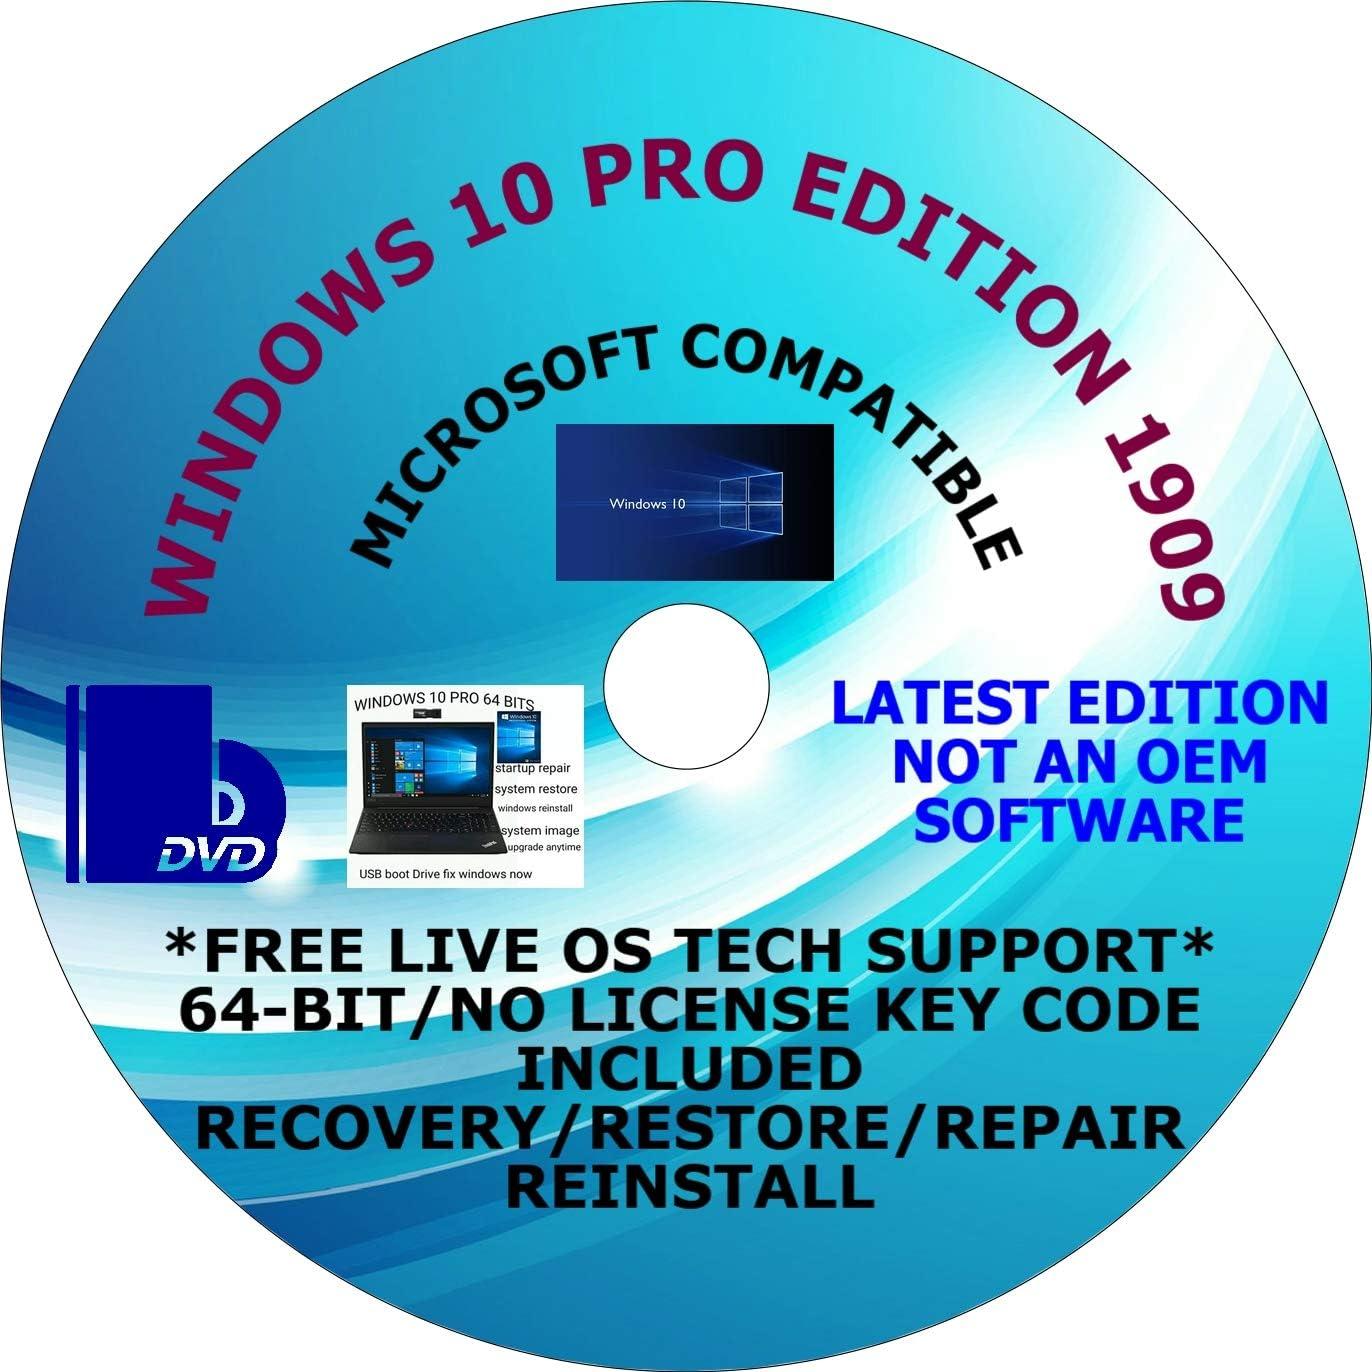 WINDOWS 10 PRO 64-BIT DVD DO-IT-YOURSELF REINSTALL Factory outlet PLUS FREE VID Ultra-Cheap Deals